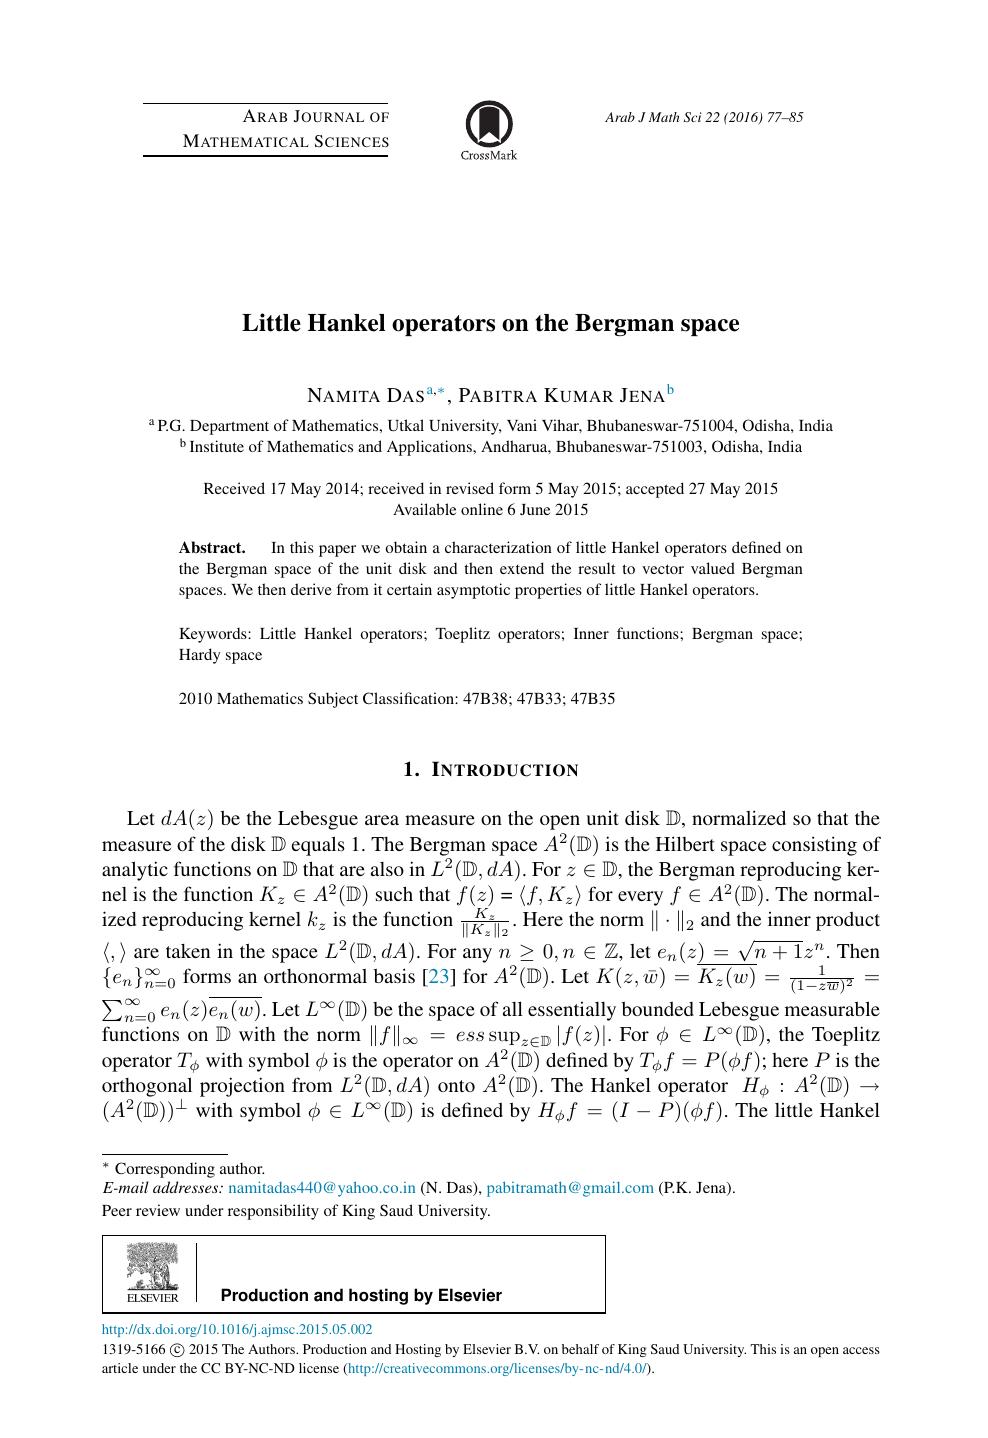 Little Hankel operators on the Bergman space – topic of research